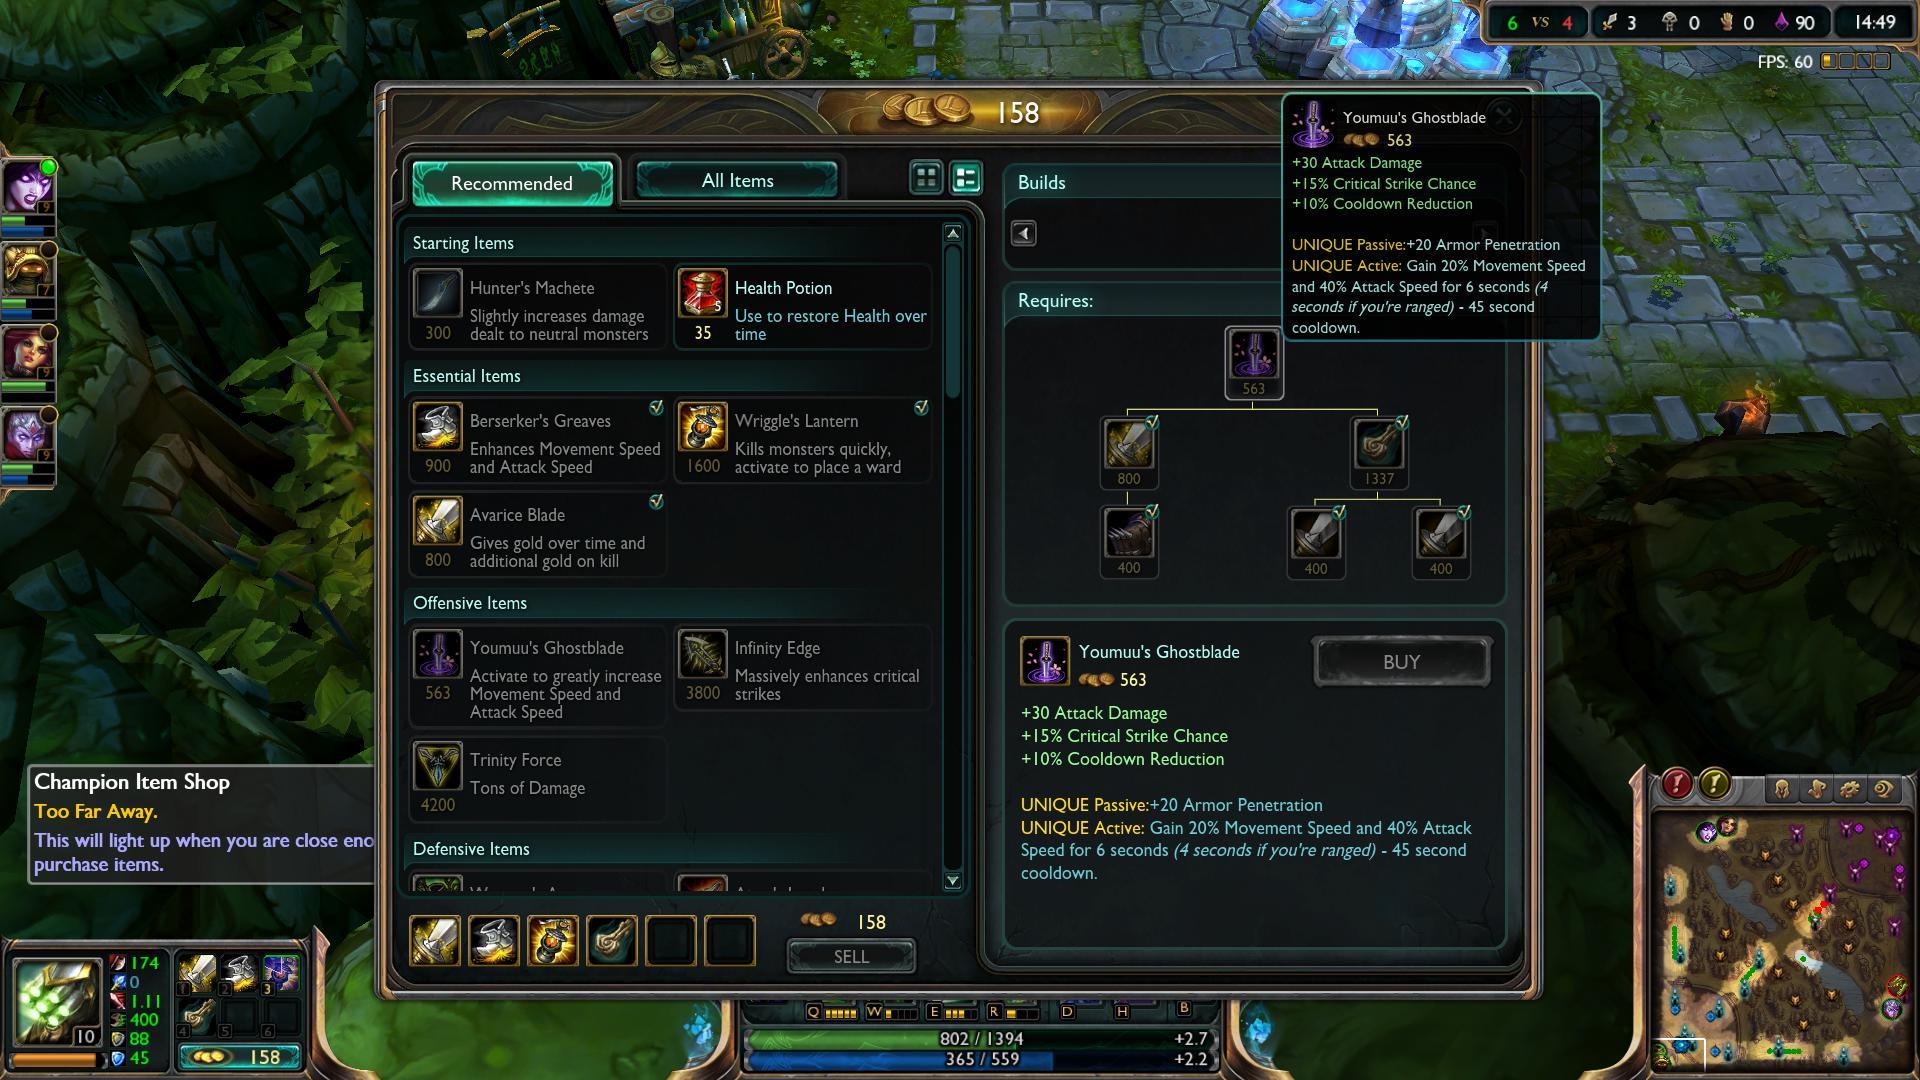 https://www gamingcfg com/screenshot/cs-go-dust-a-spot-26